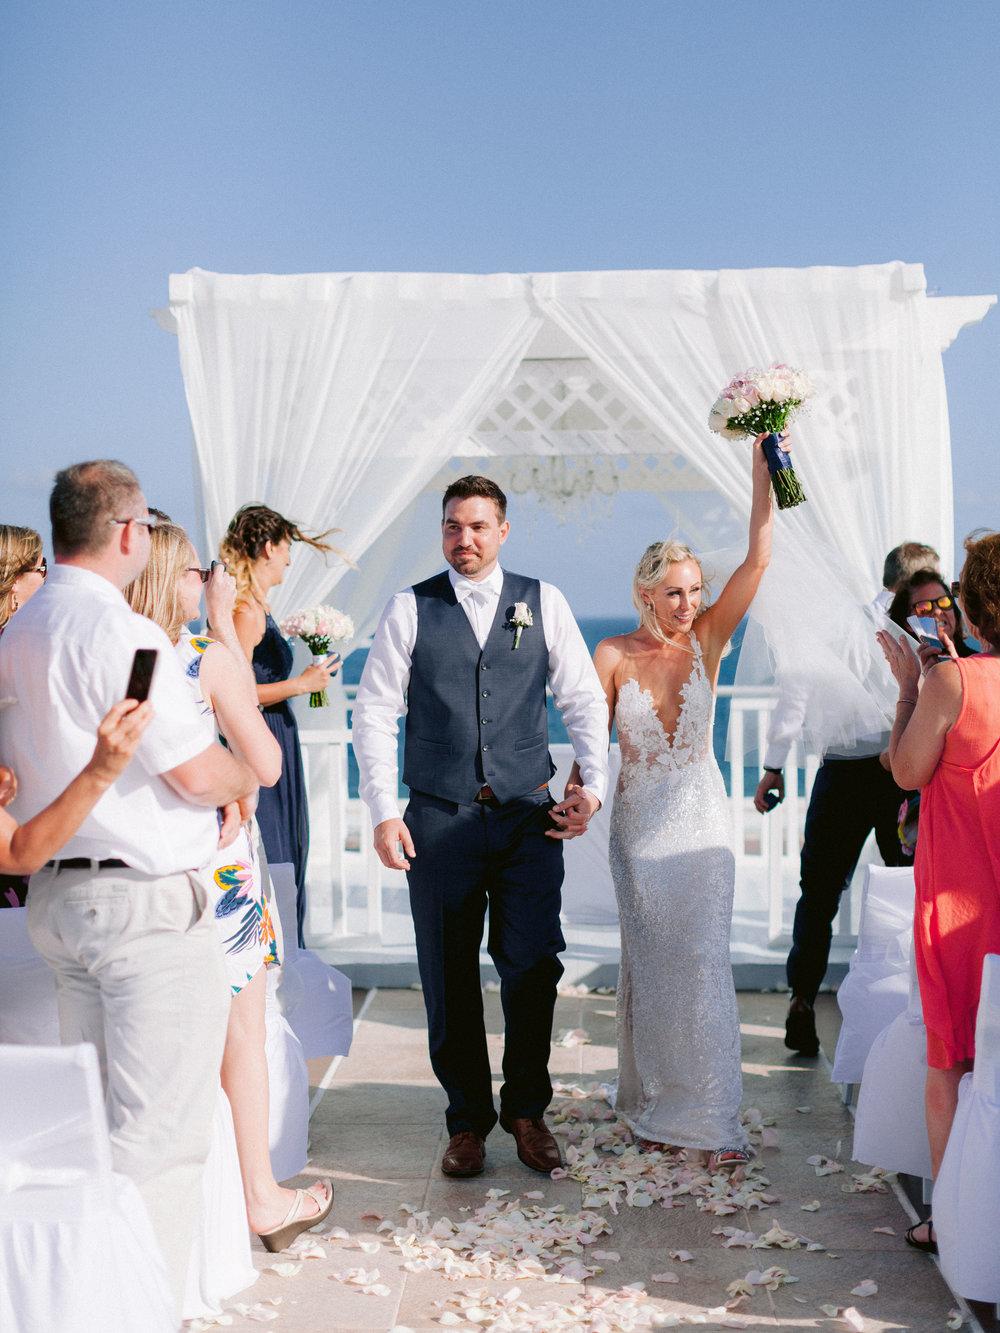 Kim_Jeff_Cancun Wedding_Ceremony_Kurtz_Orpia (100 of 119).jpg